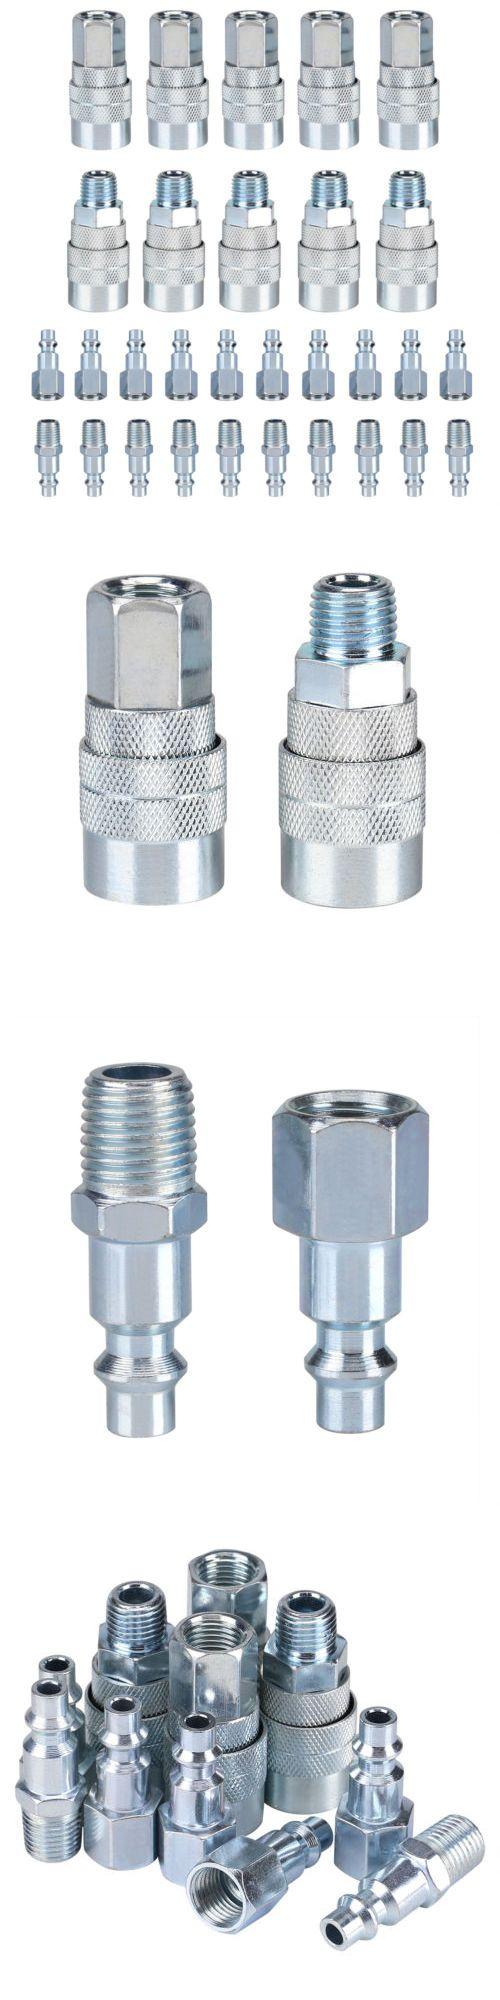 Parts and Accessories 42247 30Pcs Quick Coupler Set Air